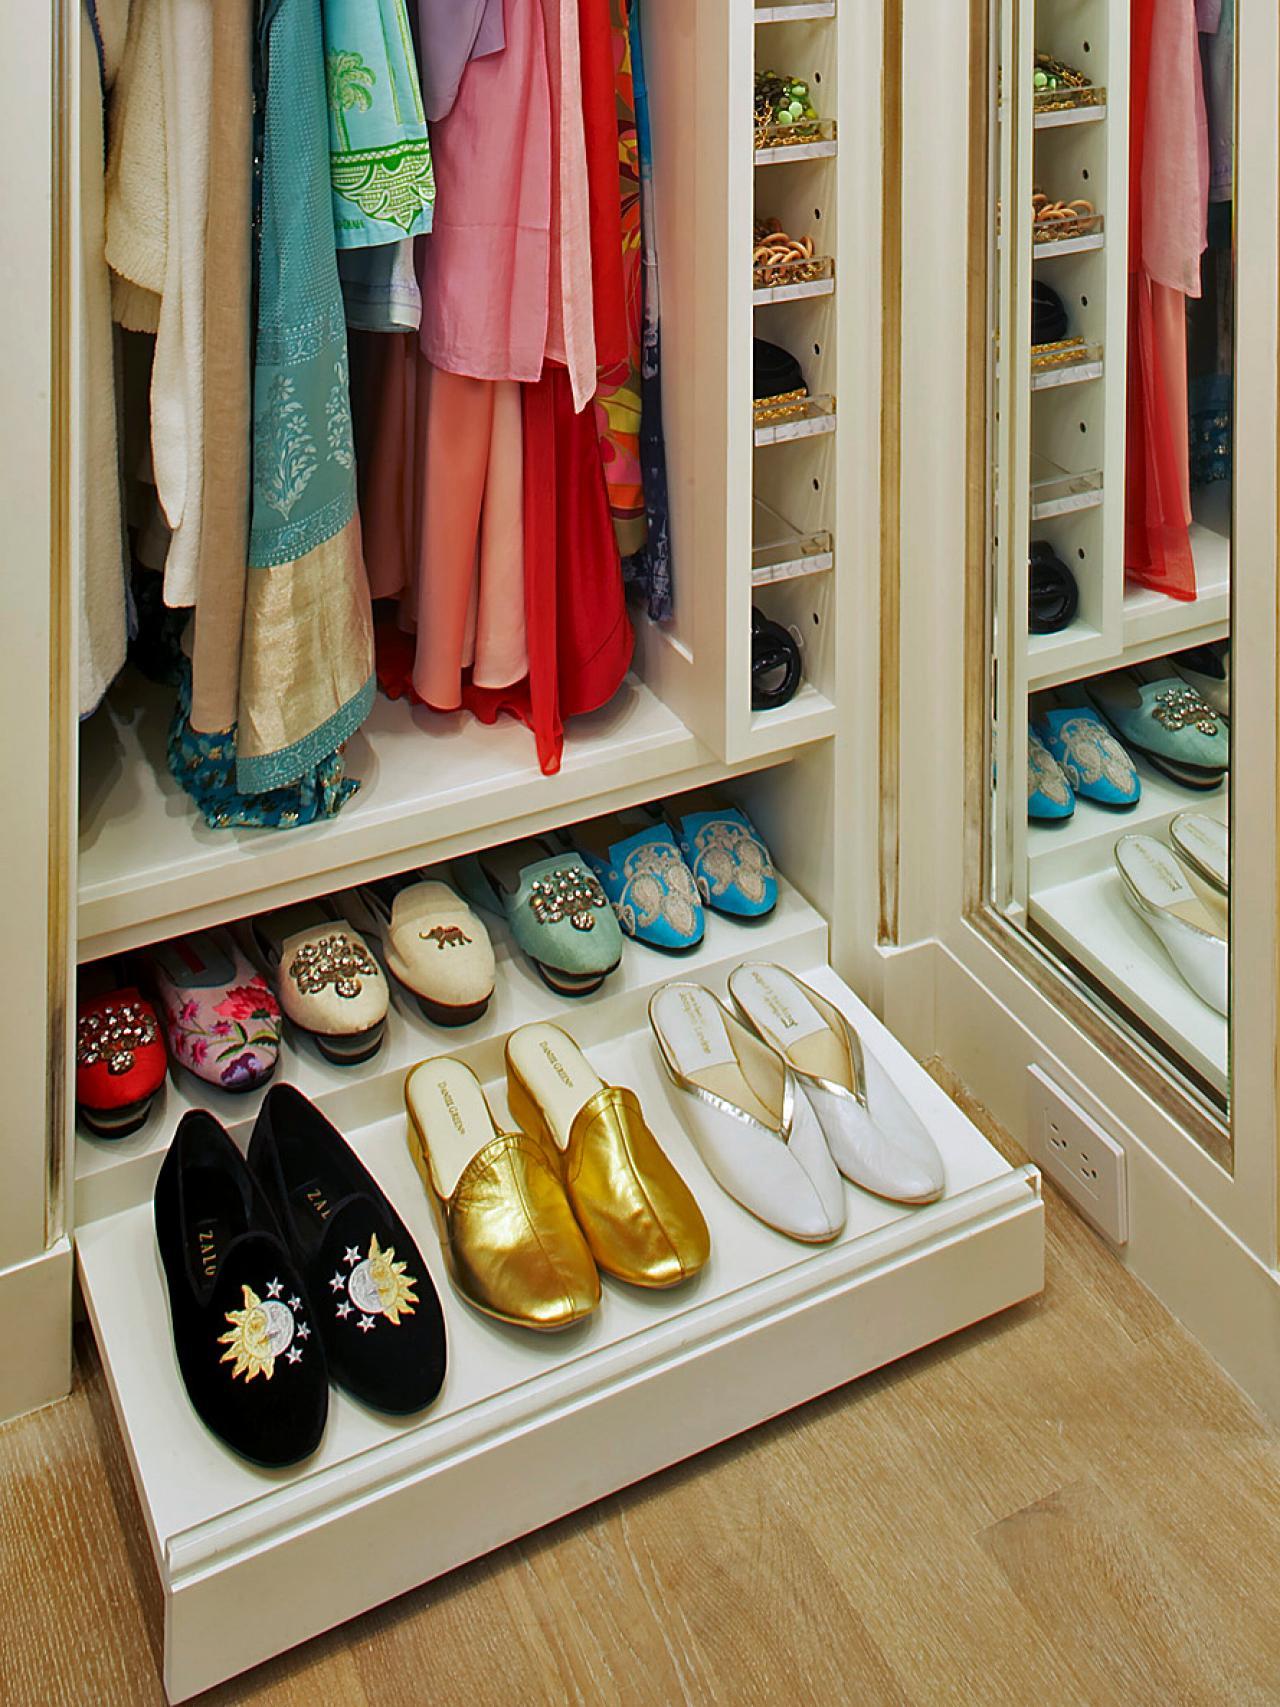 Original_Clos-ette-pull-out-shoe-drawer_s3x4.jpg.rend.hgtvcom.1280.1707